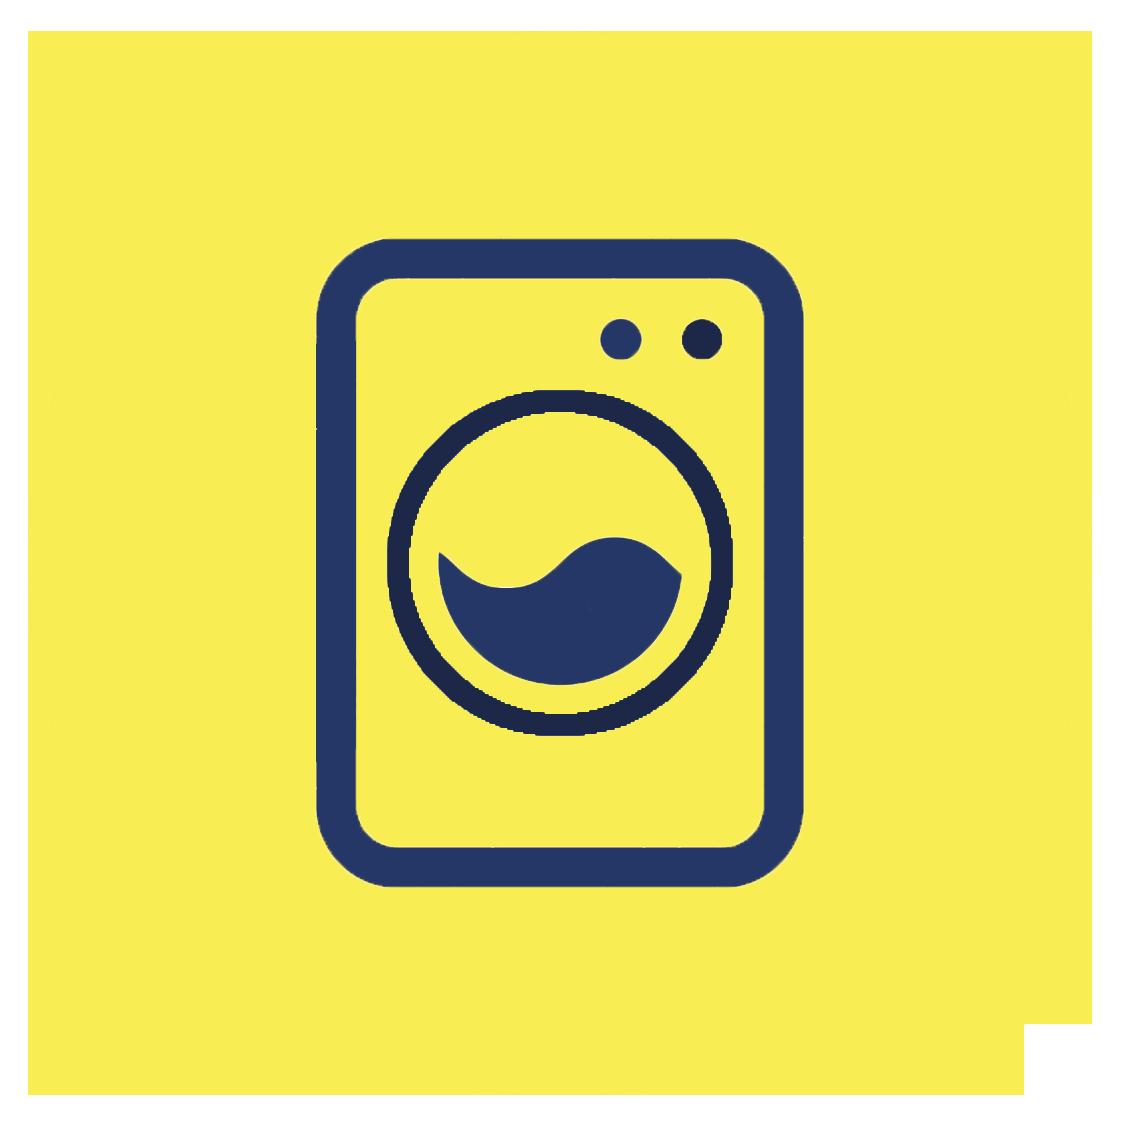 icone machine à laver